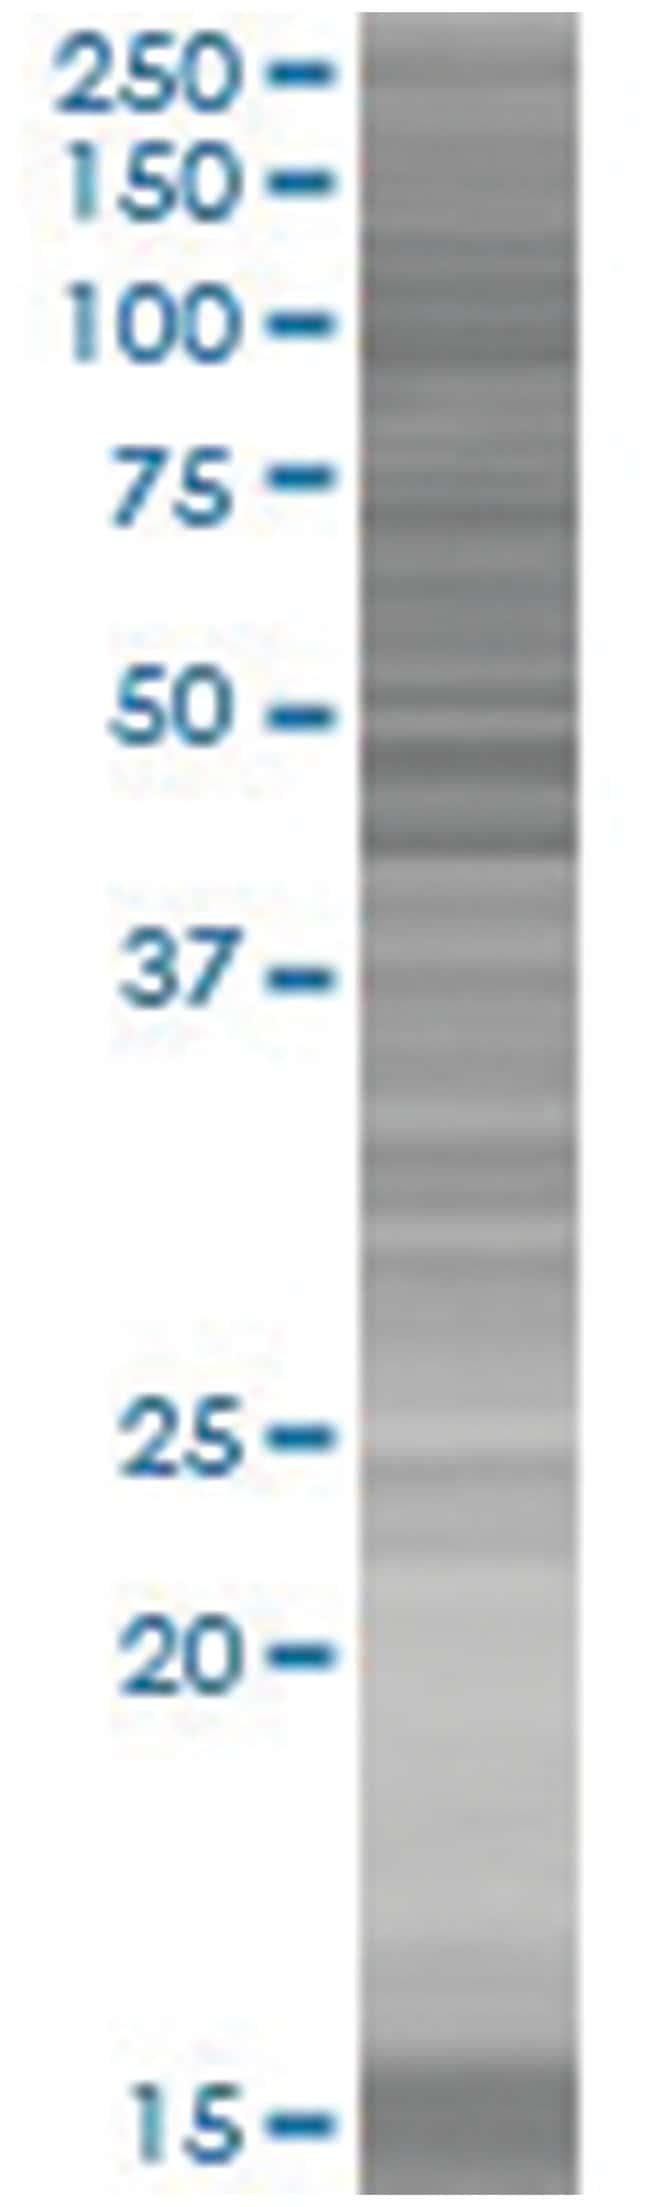 DMRT1 293T Cell Overexpression Lysate (Denatured), Abnova 100µL:Life